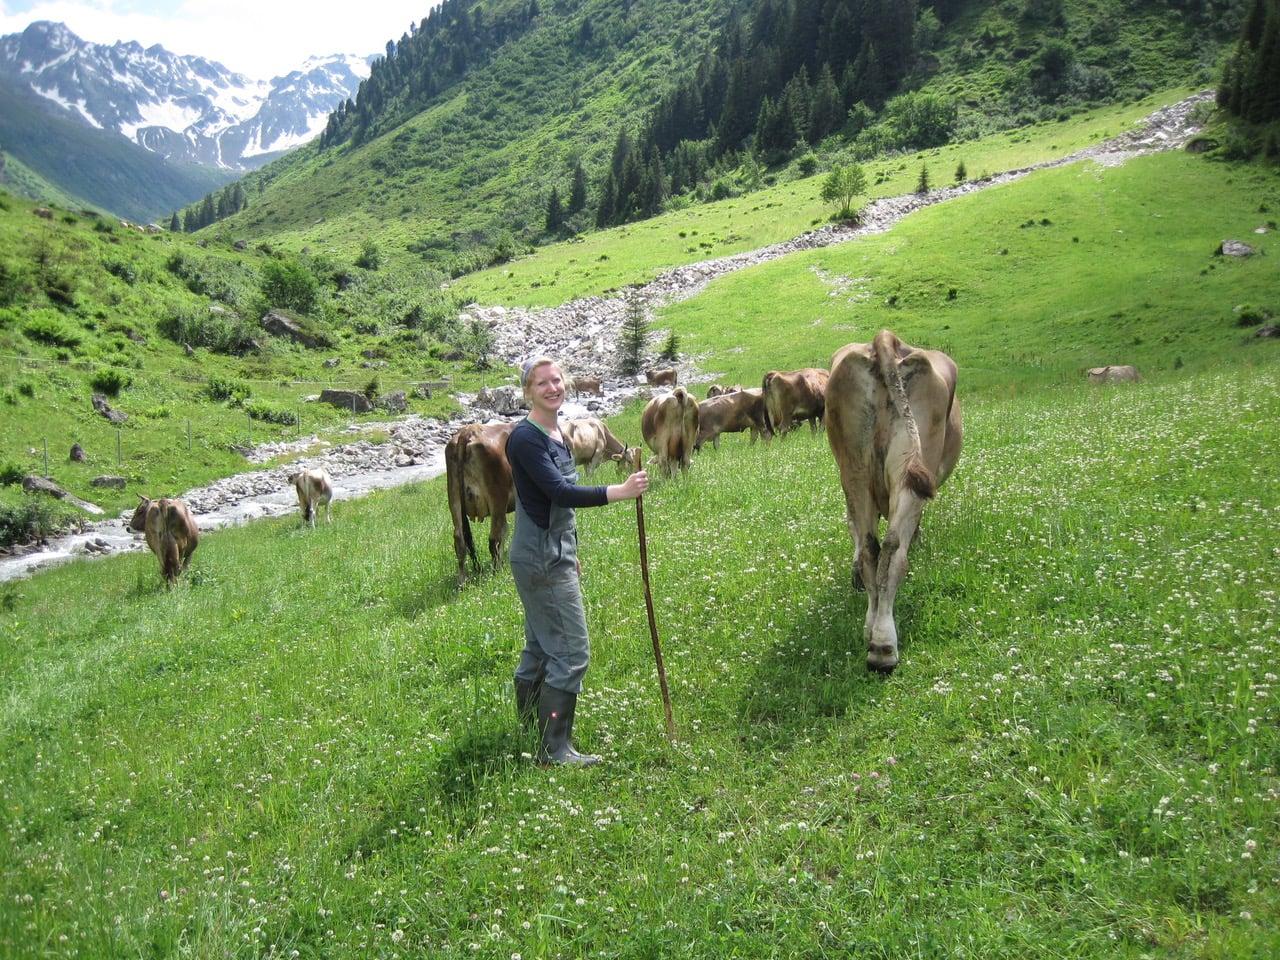 WWOOF_Viehhaltung Vbg